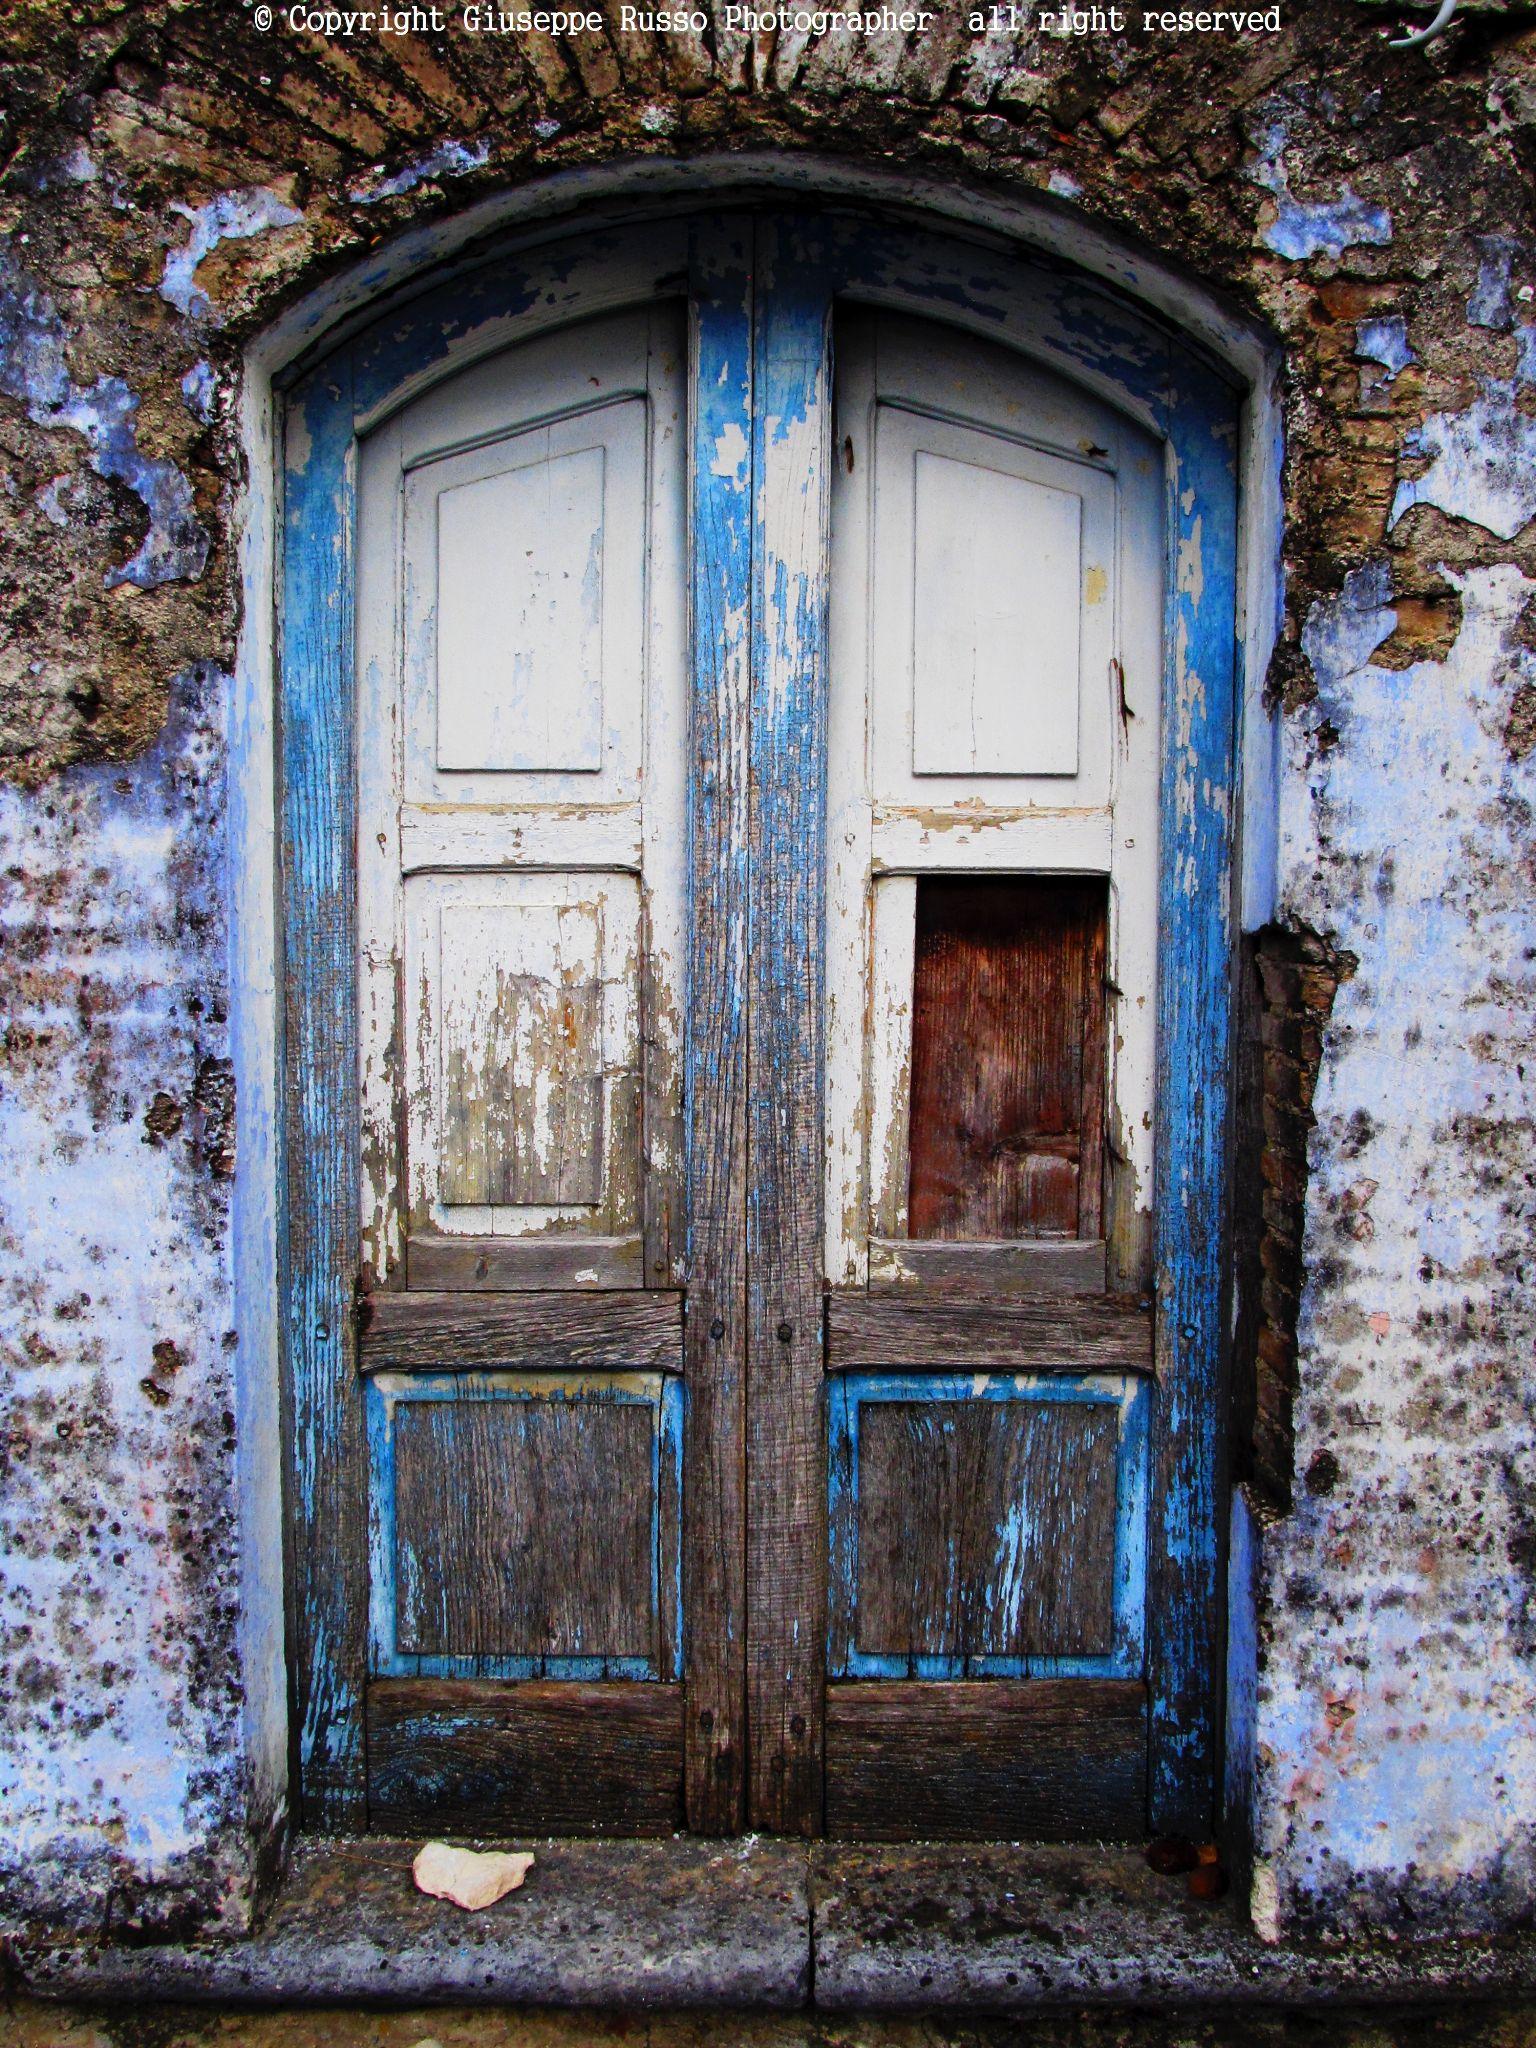 Blue nostalgy by Joseph71